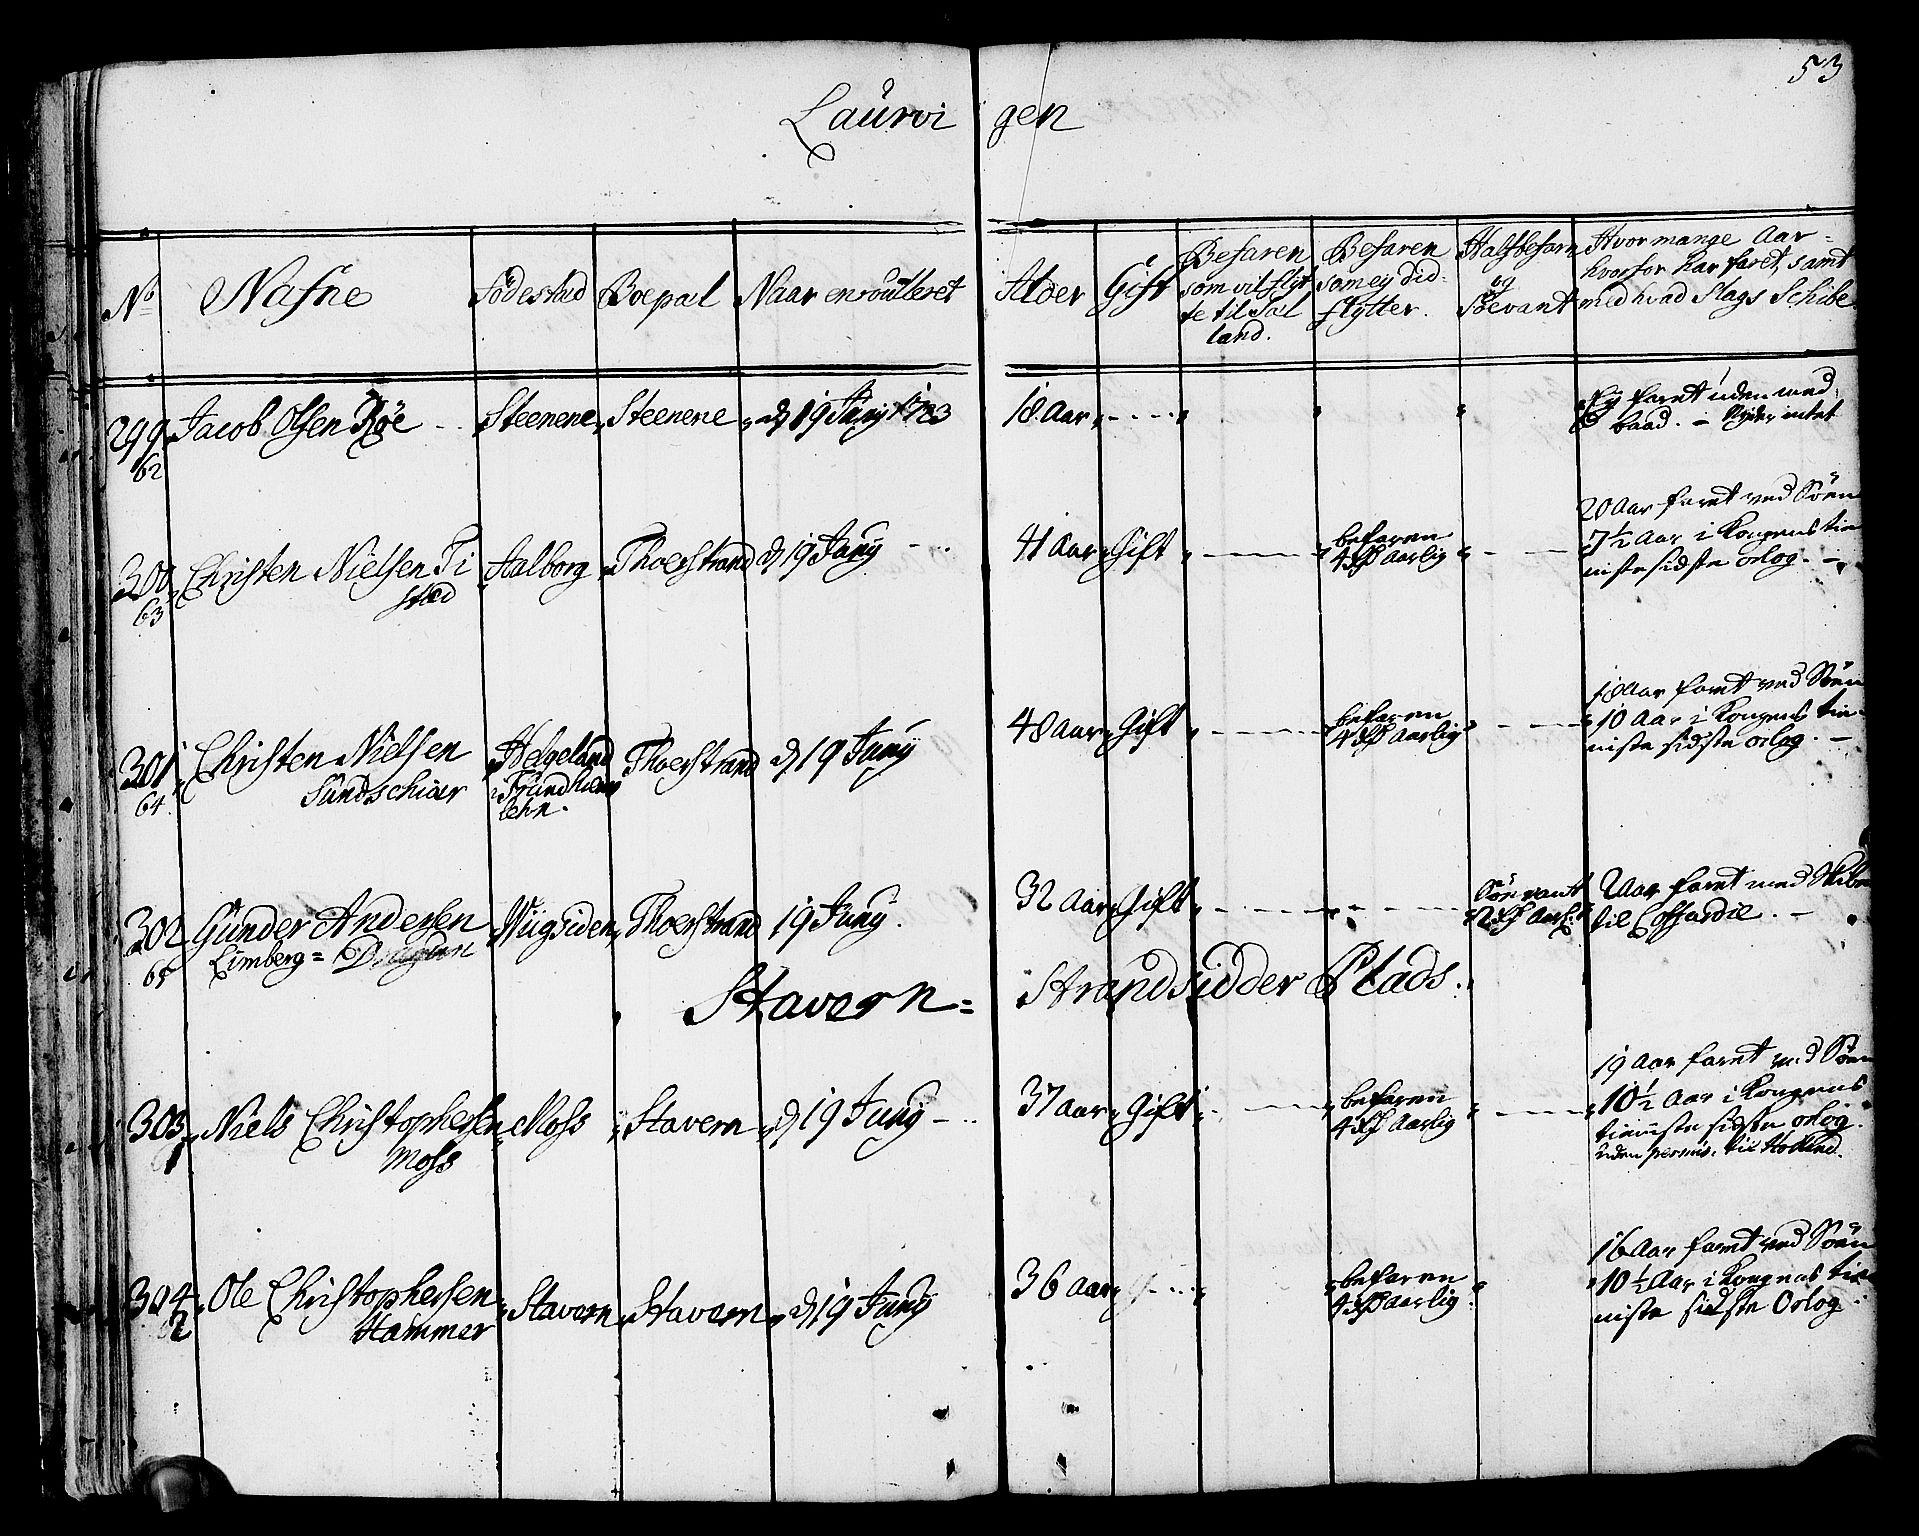 SAKO, Drammen innrulleringsdistrikt, F/Fa/L0002: Hovedrulle, 1723-1726, s. 54